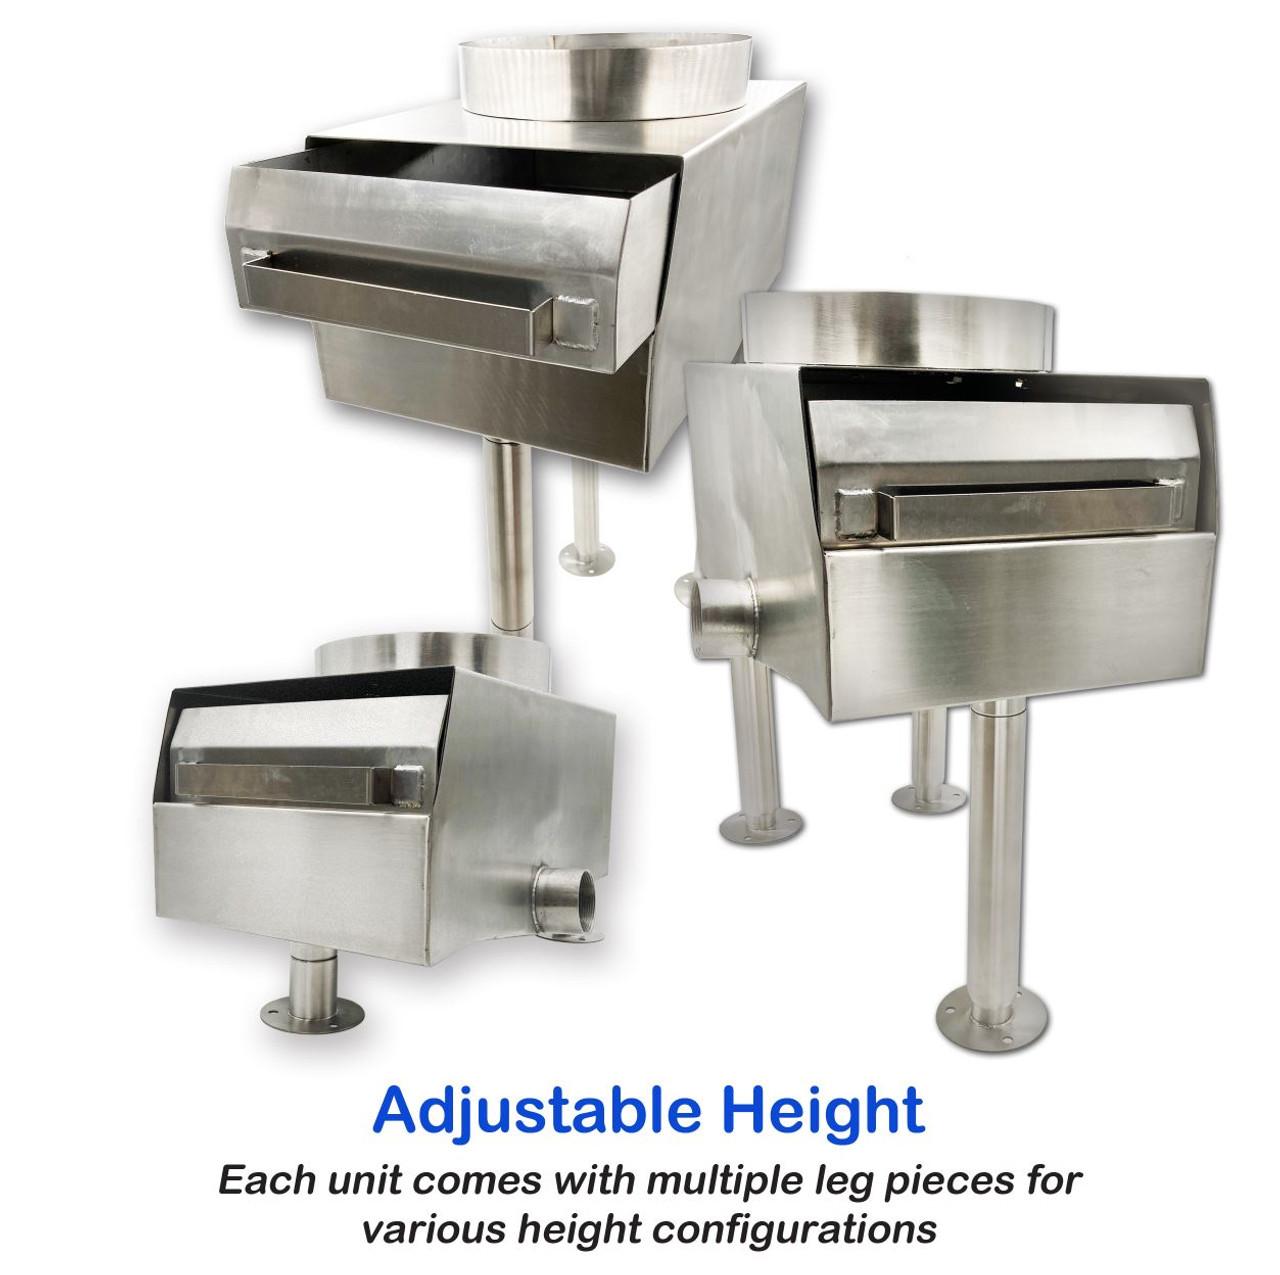 Wet Waste Interceptor for commercial kitchen sinks